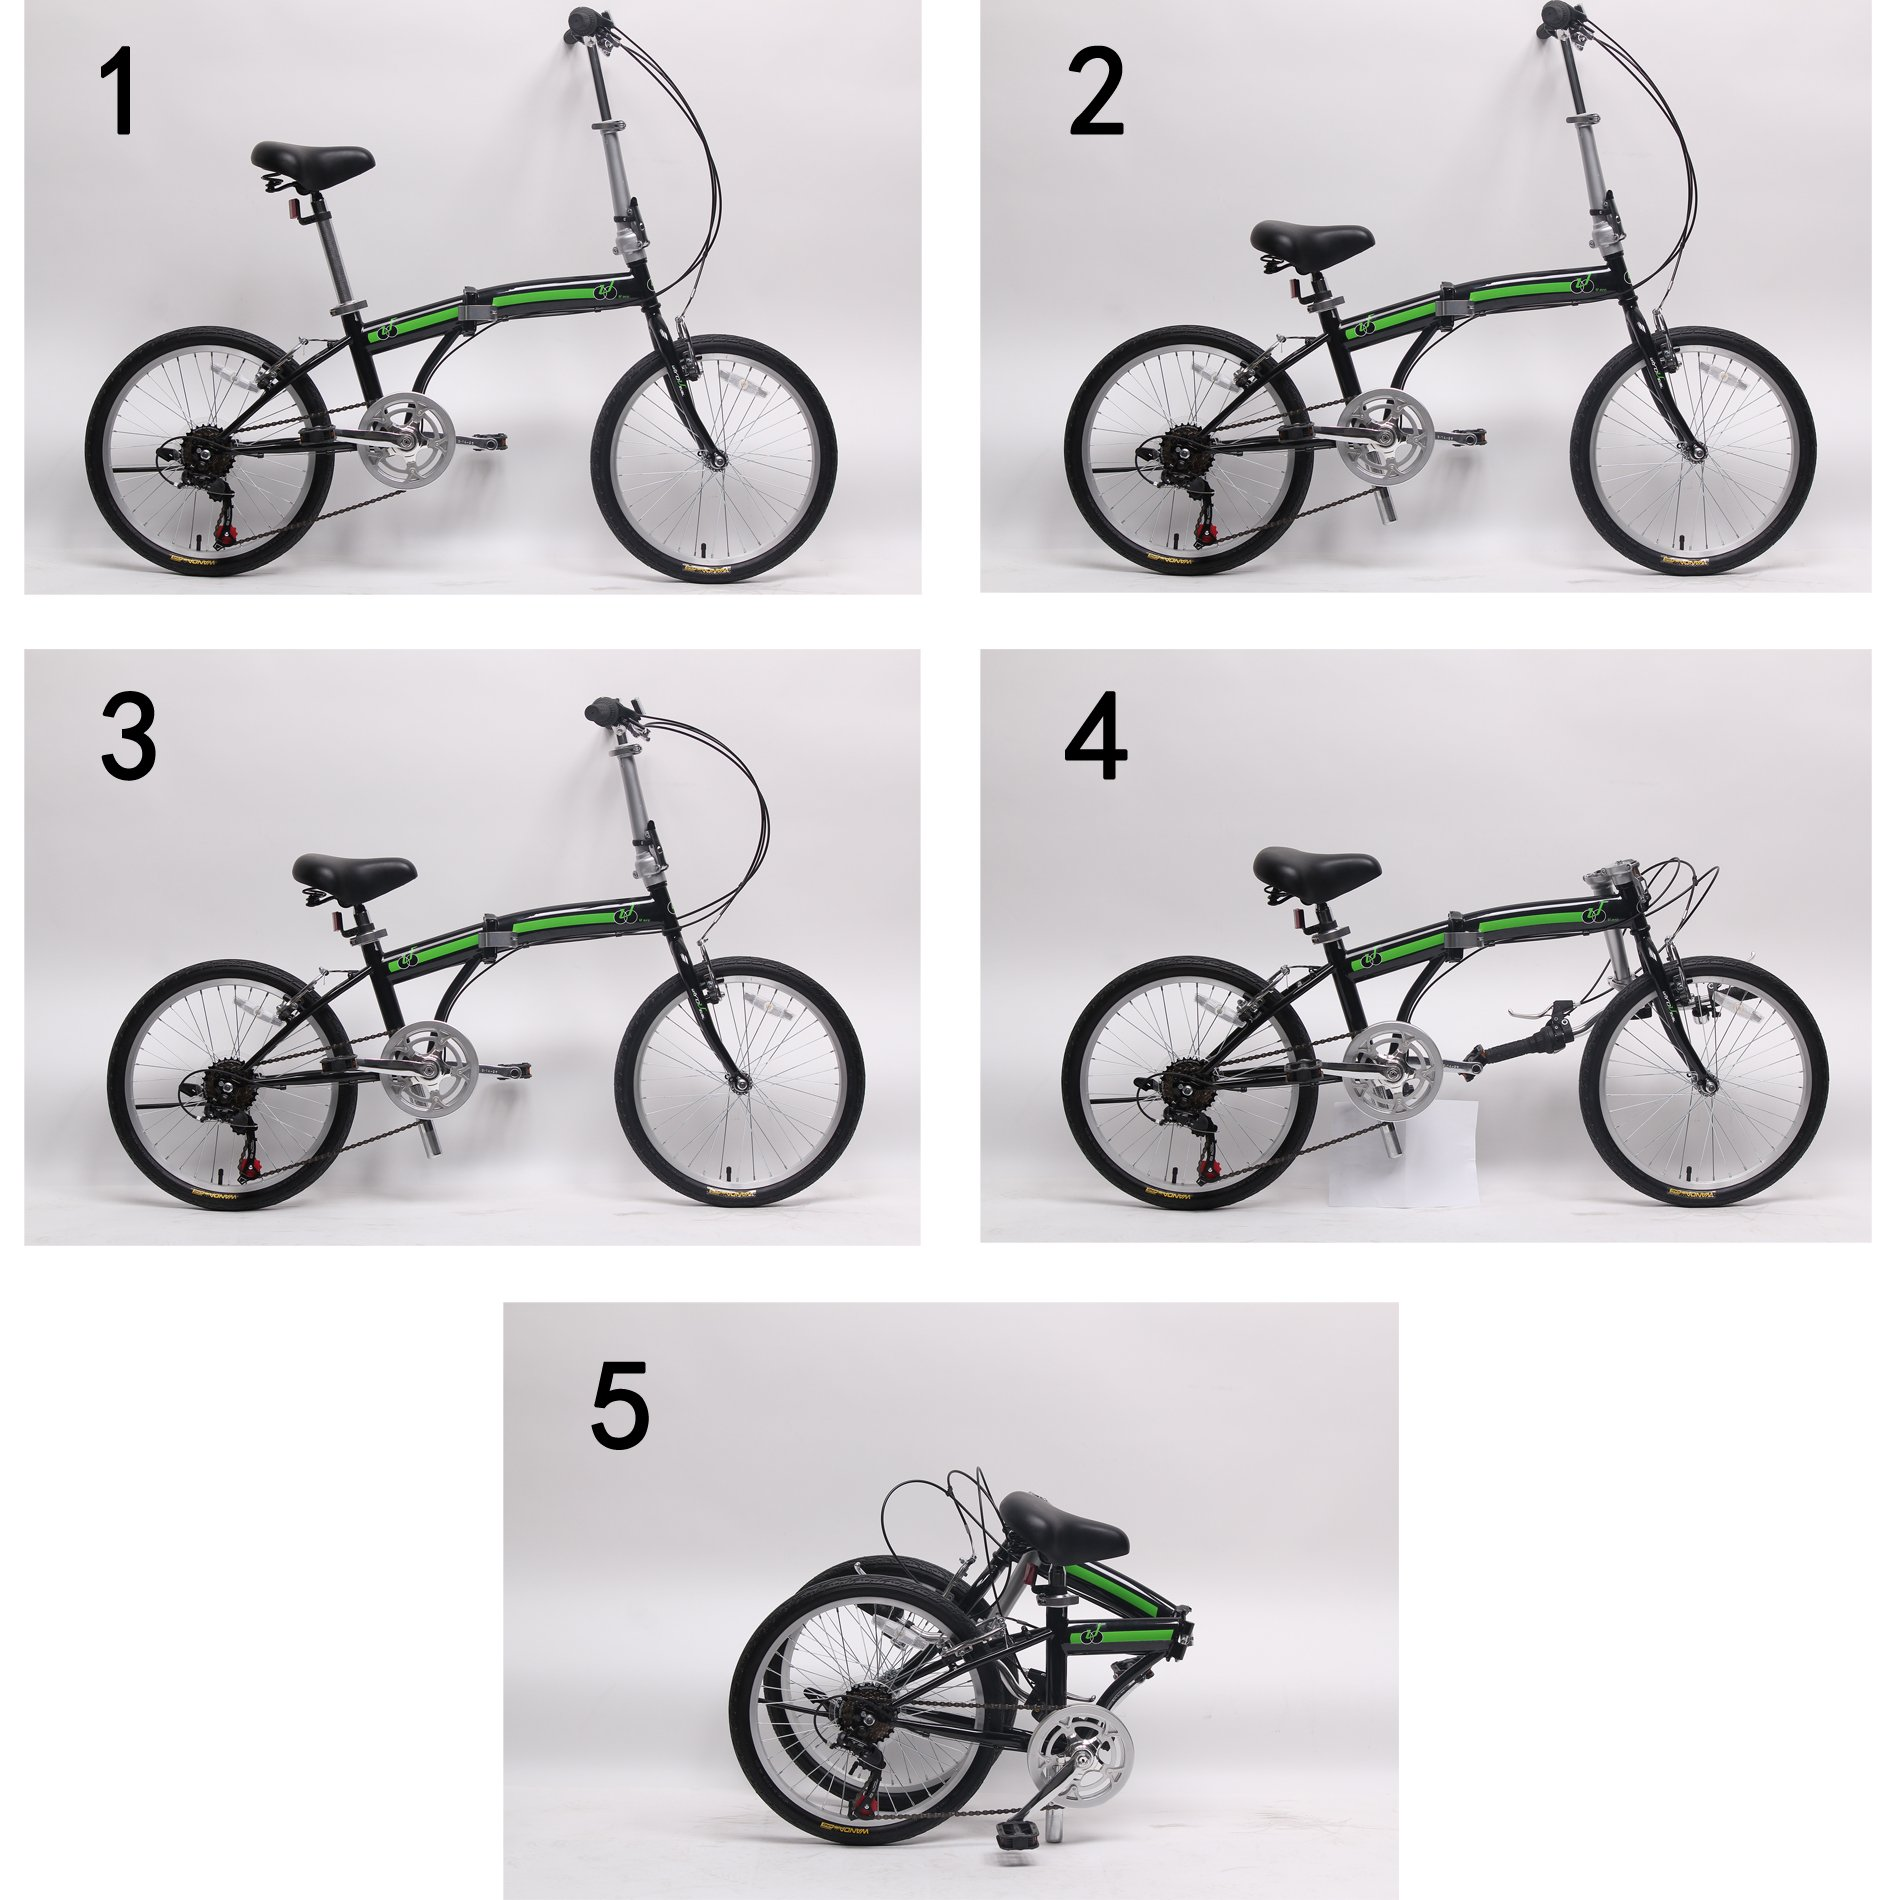 IDS Home Unyousual U Arc Folding City Bike Bicycle 6 Speed Steel Frame Shimano Gear Wanda Tire, Black by IDS Home (Image #8)